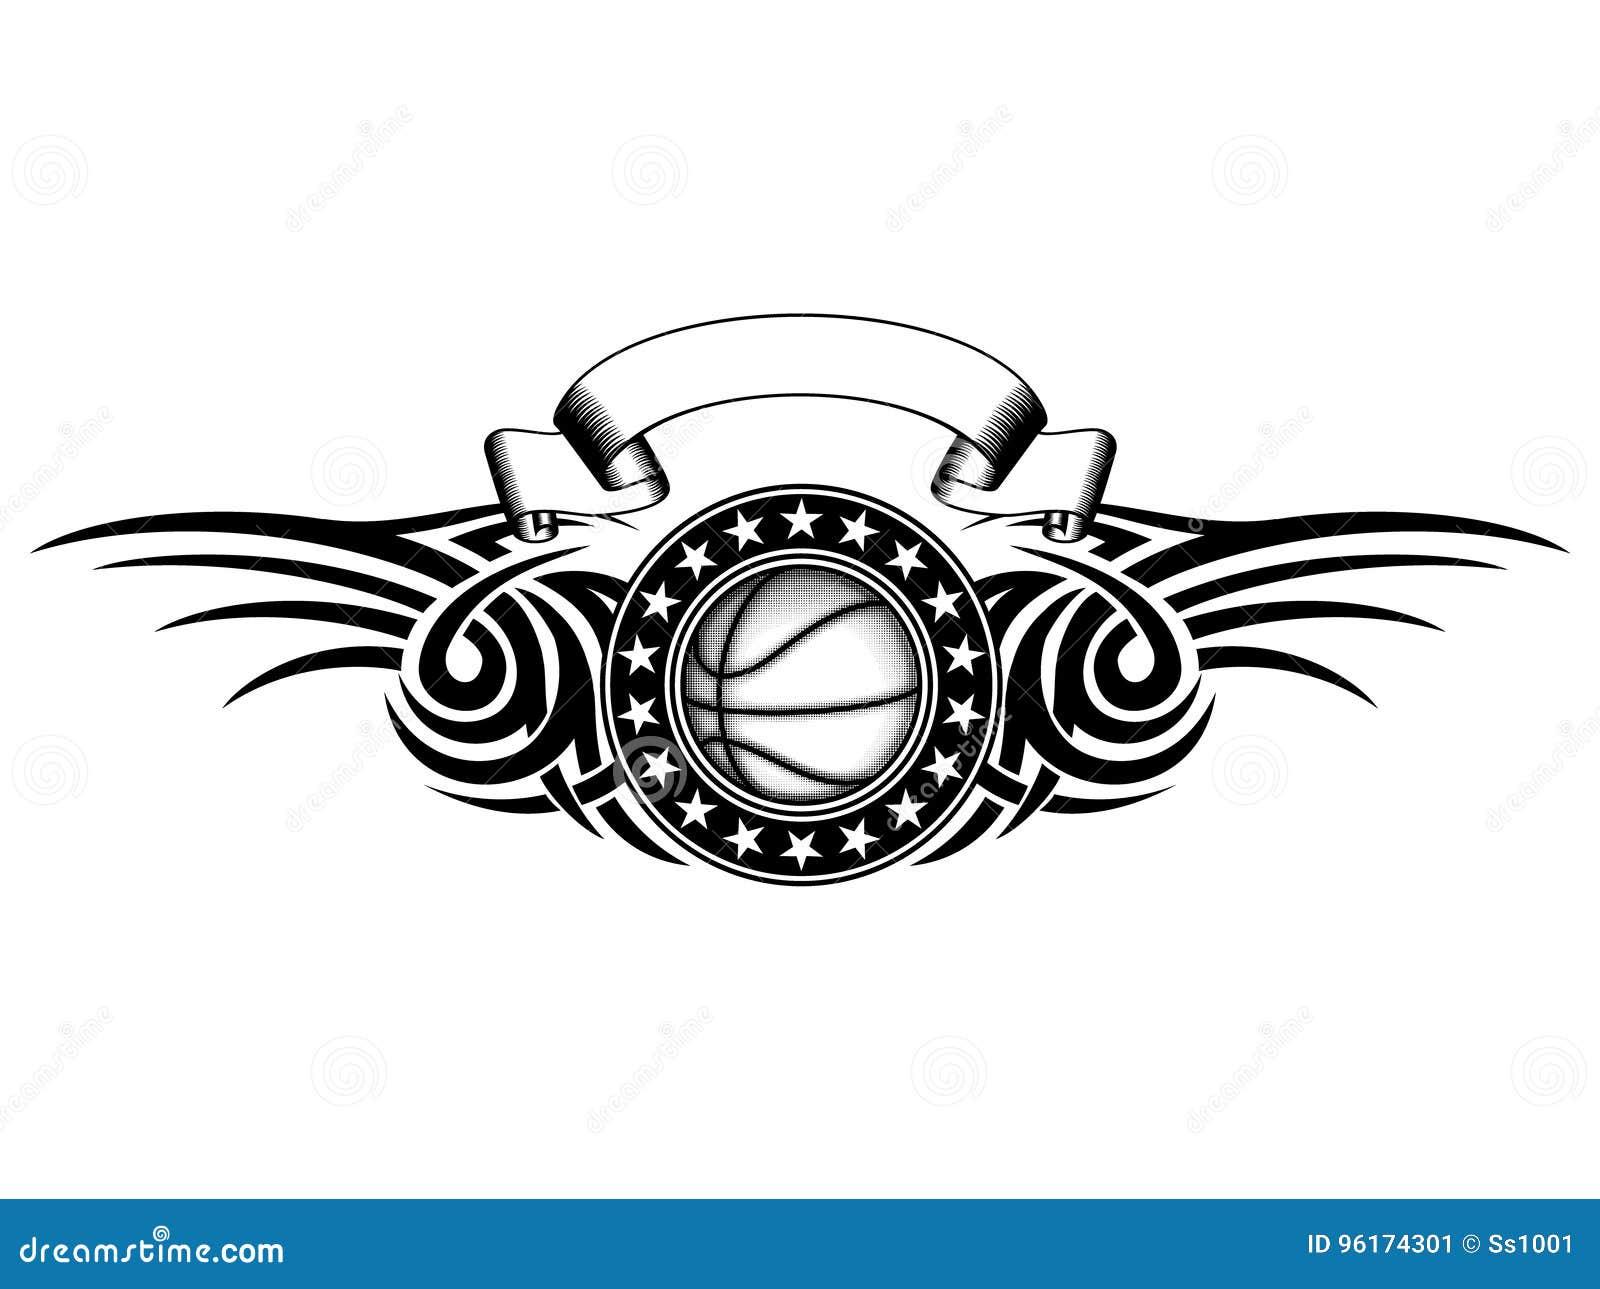 Basketball Tribal Stock Vector Illustration Of Element 96174301